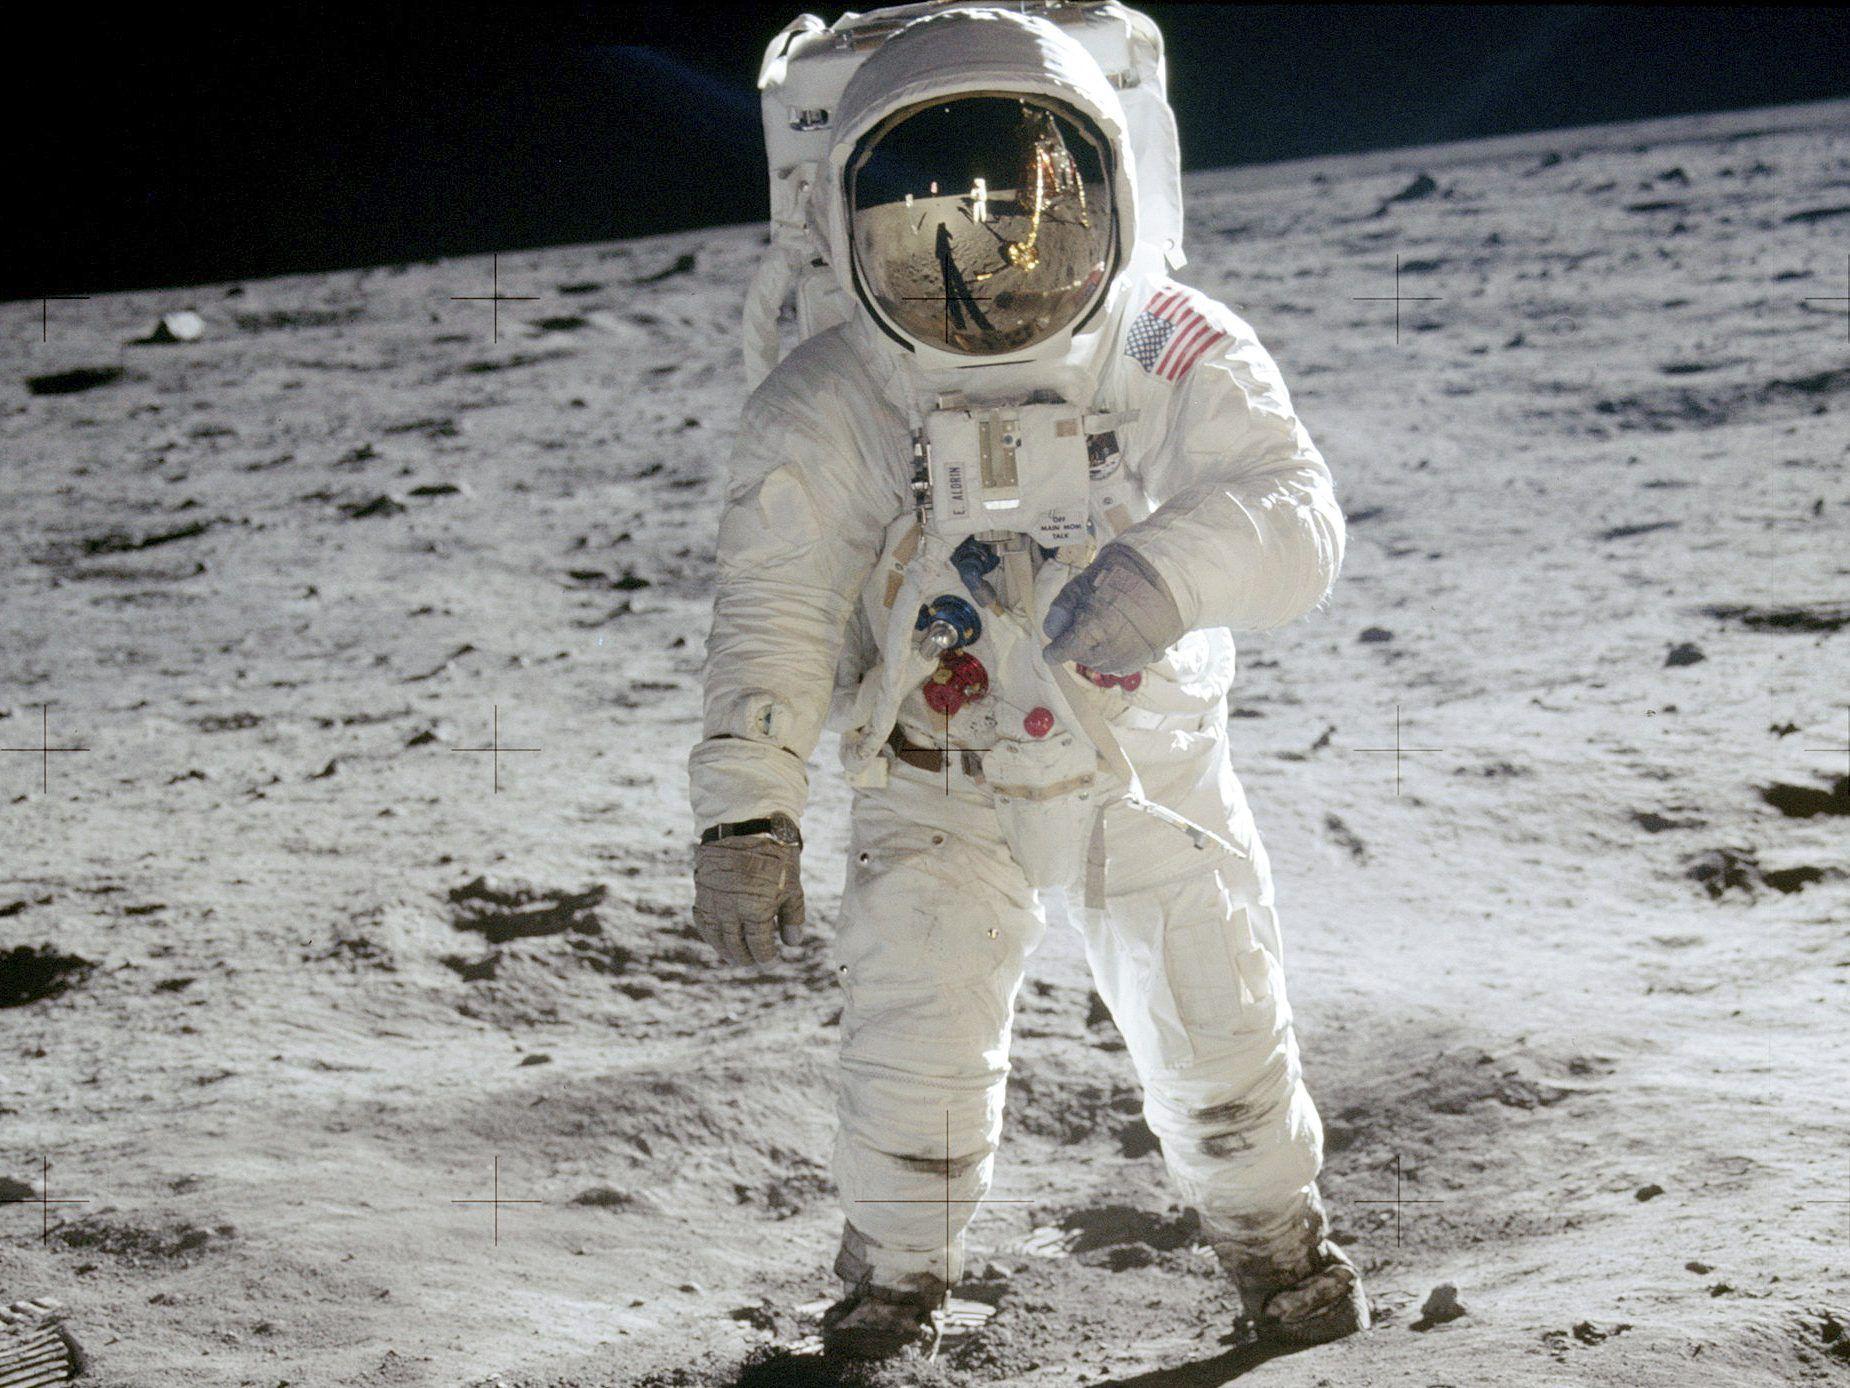 1. Mondlandung